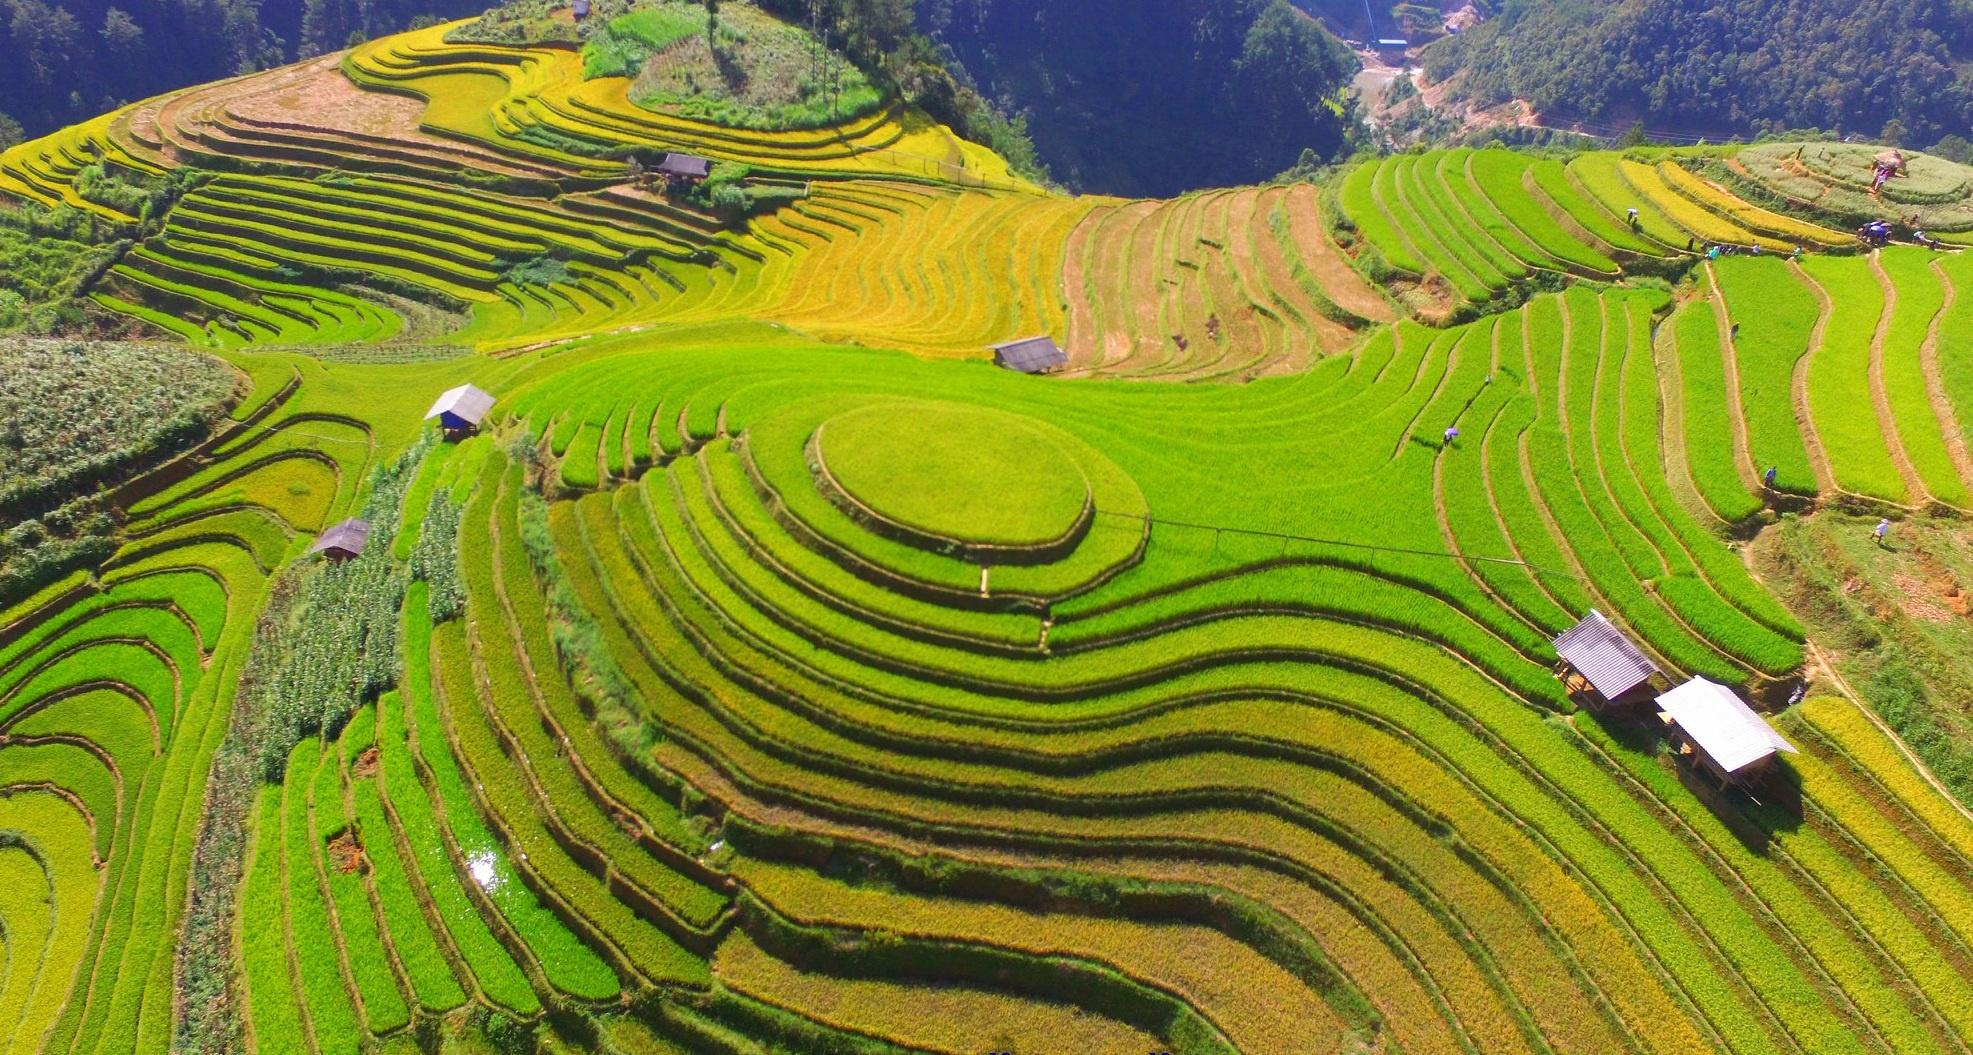 le-hoi-ruong-bac-thang-mu-cang-chai-2020-vietmountain-travel (2)